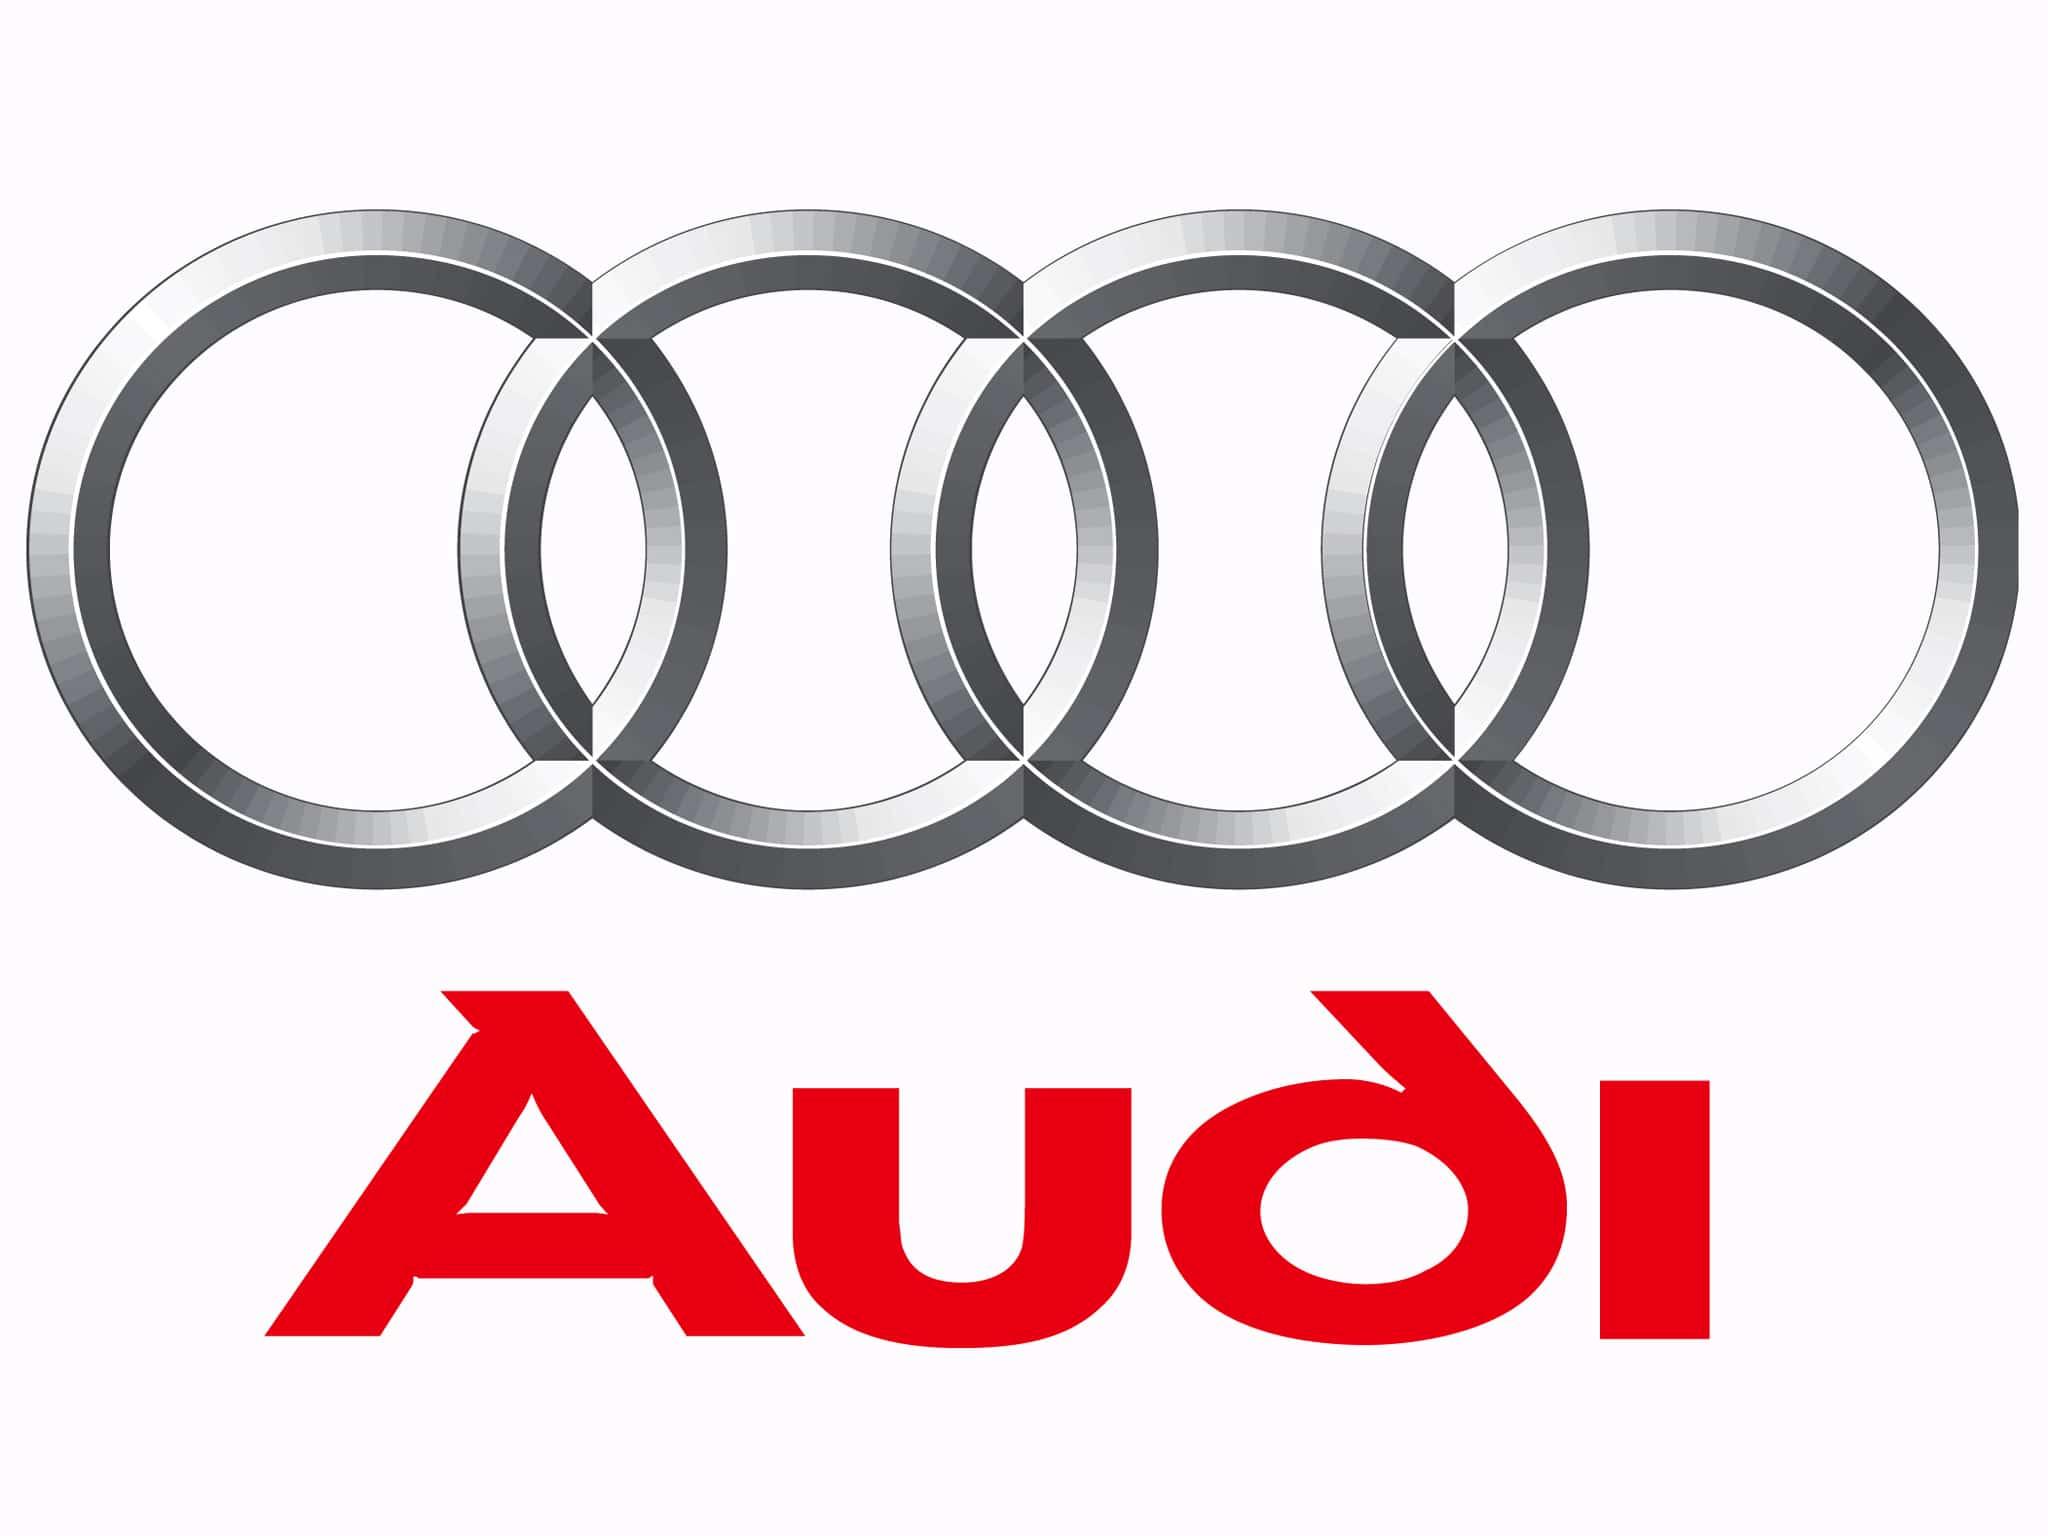 Manual Audi S4 2010 Reparación